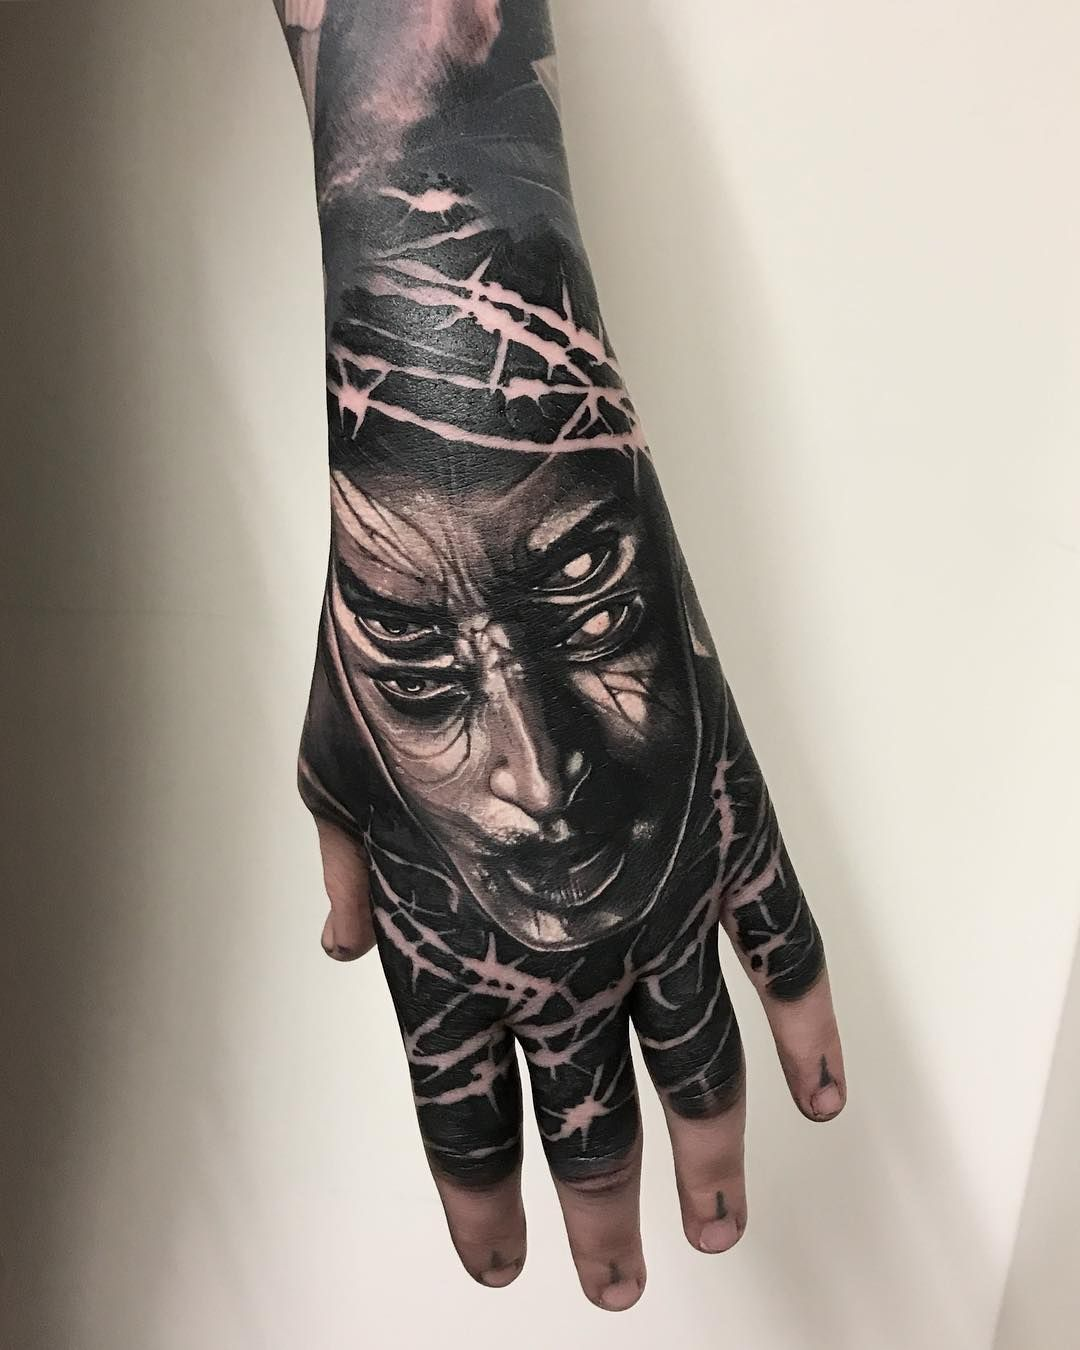 Glove For Hollieprycejones Thankyou Silverbackink Hustlebutterdeluxe Fkirons Killerink Hand Tats Dark Art Tattoo Body Art Tattoos